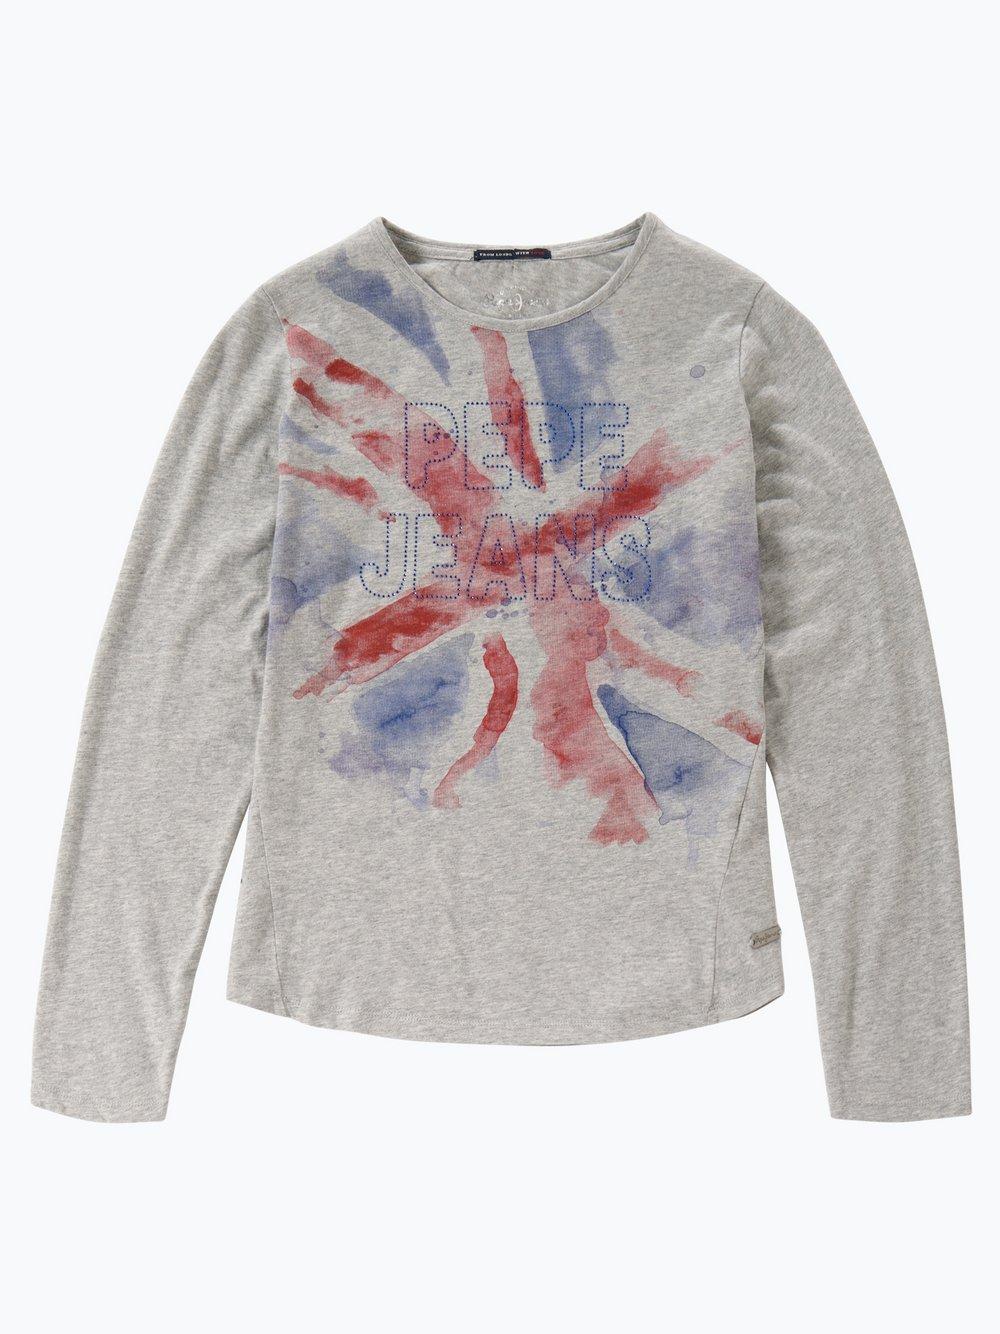 Pepe Jeans Mädchen Langarmshirt - Janis Jr online kaufen   VANGRAAF.COM b14cc3b69a